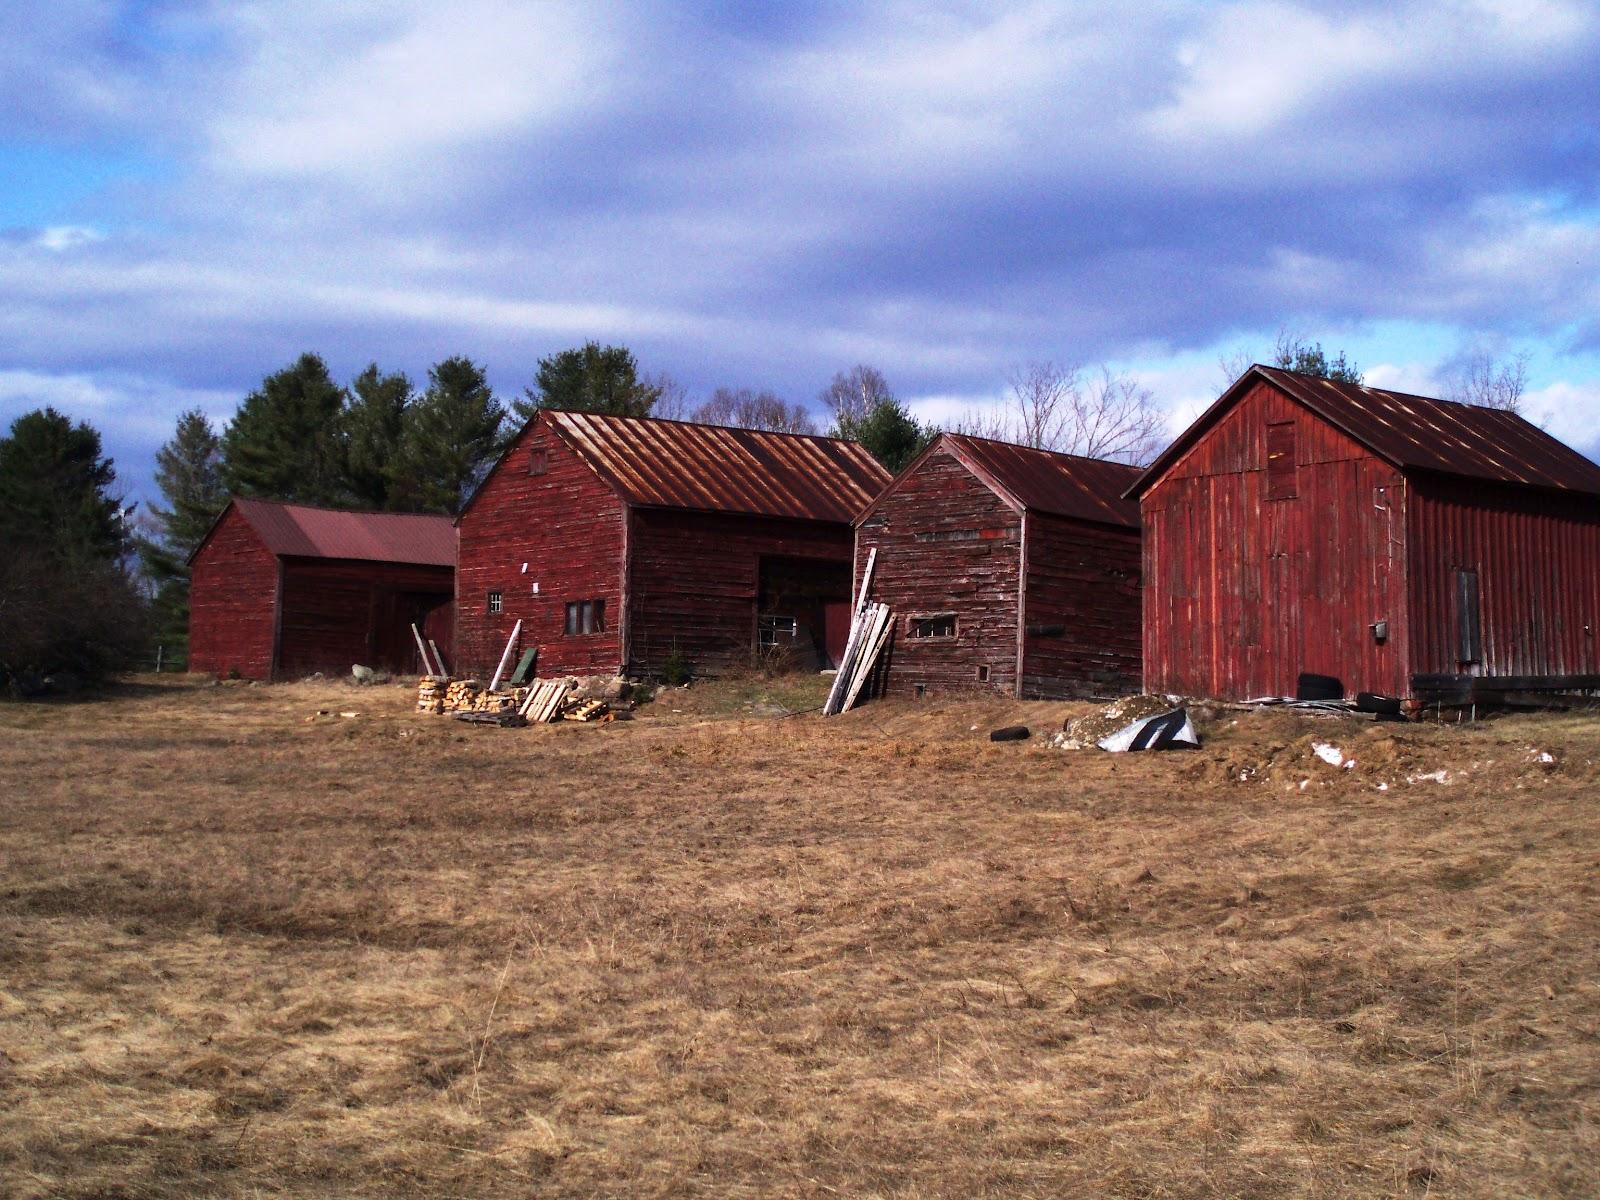 A And B Farm  Renovating Old Barns